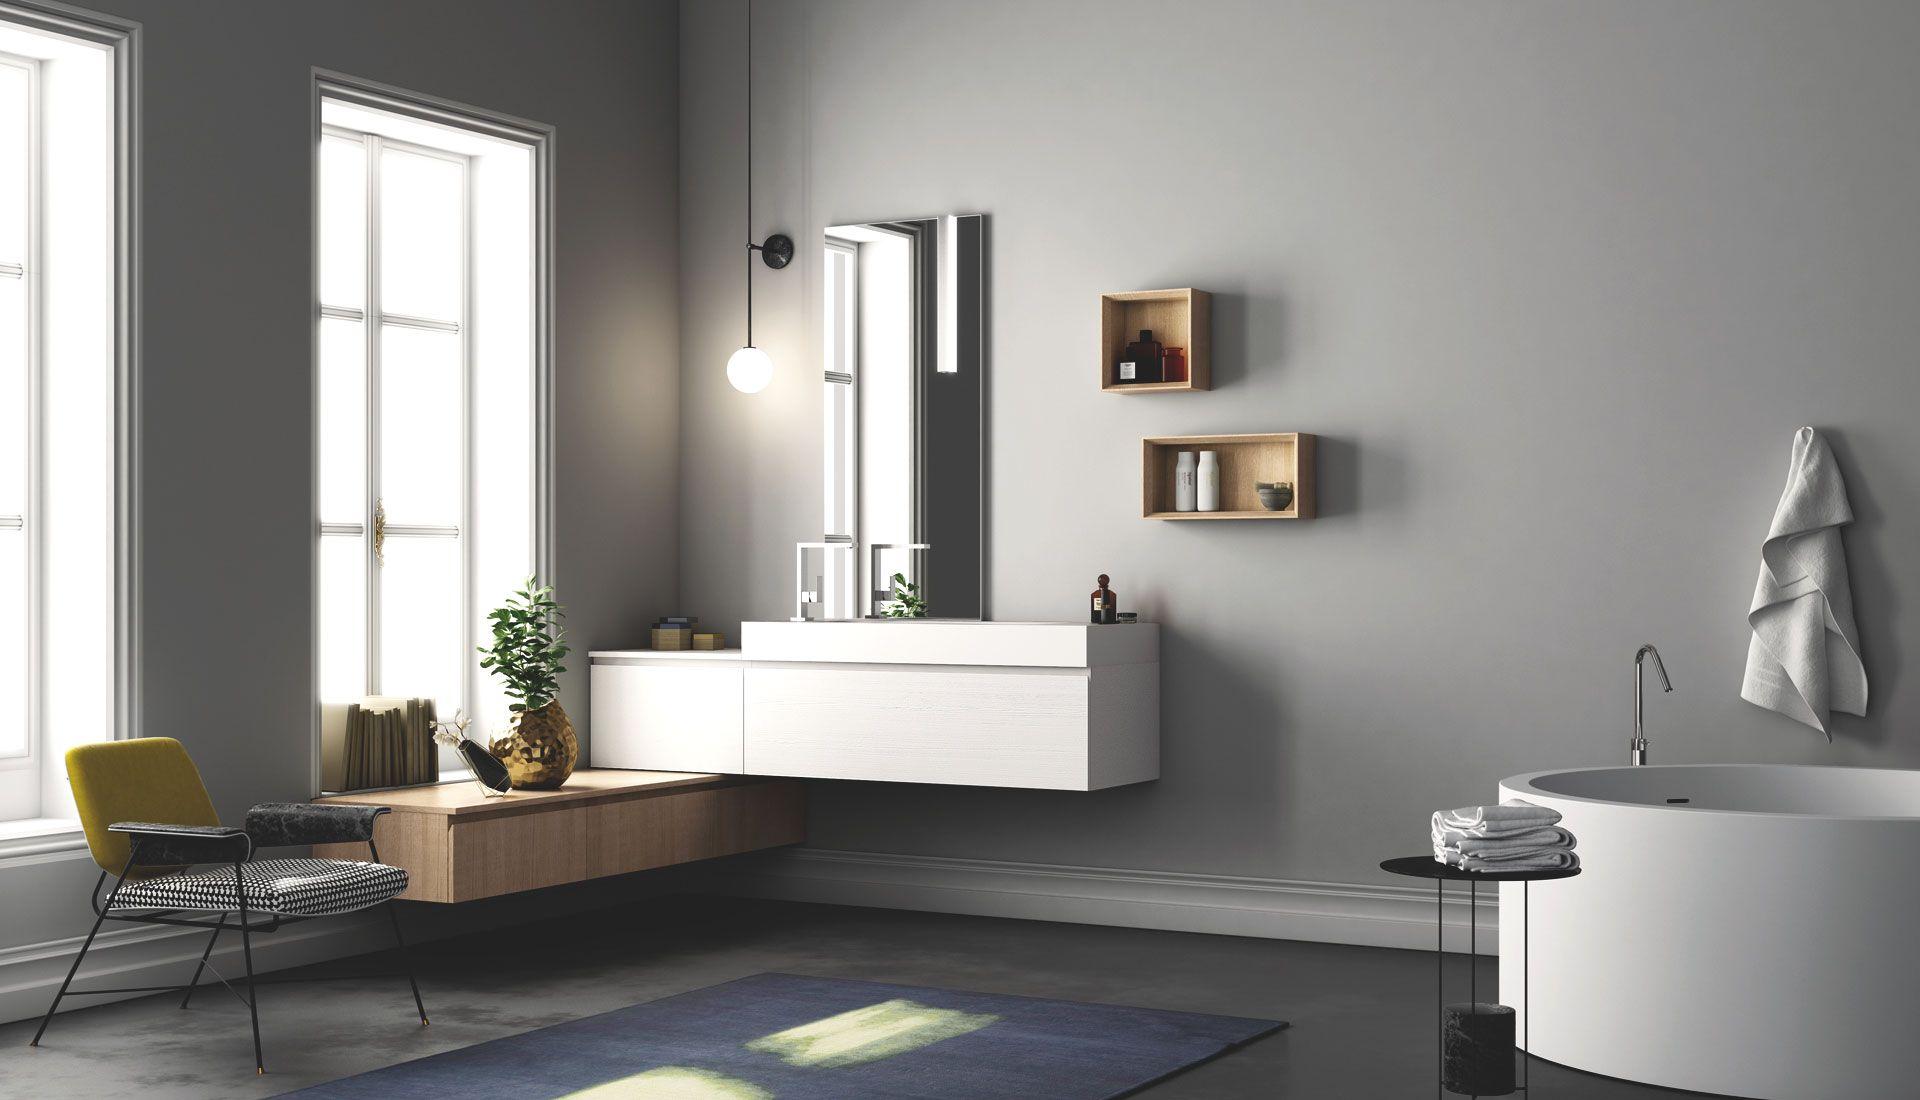 Arredo bagno con gola - Puntotre Arredobagno | Bagni | Pinterest